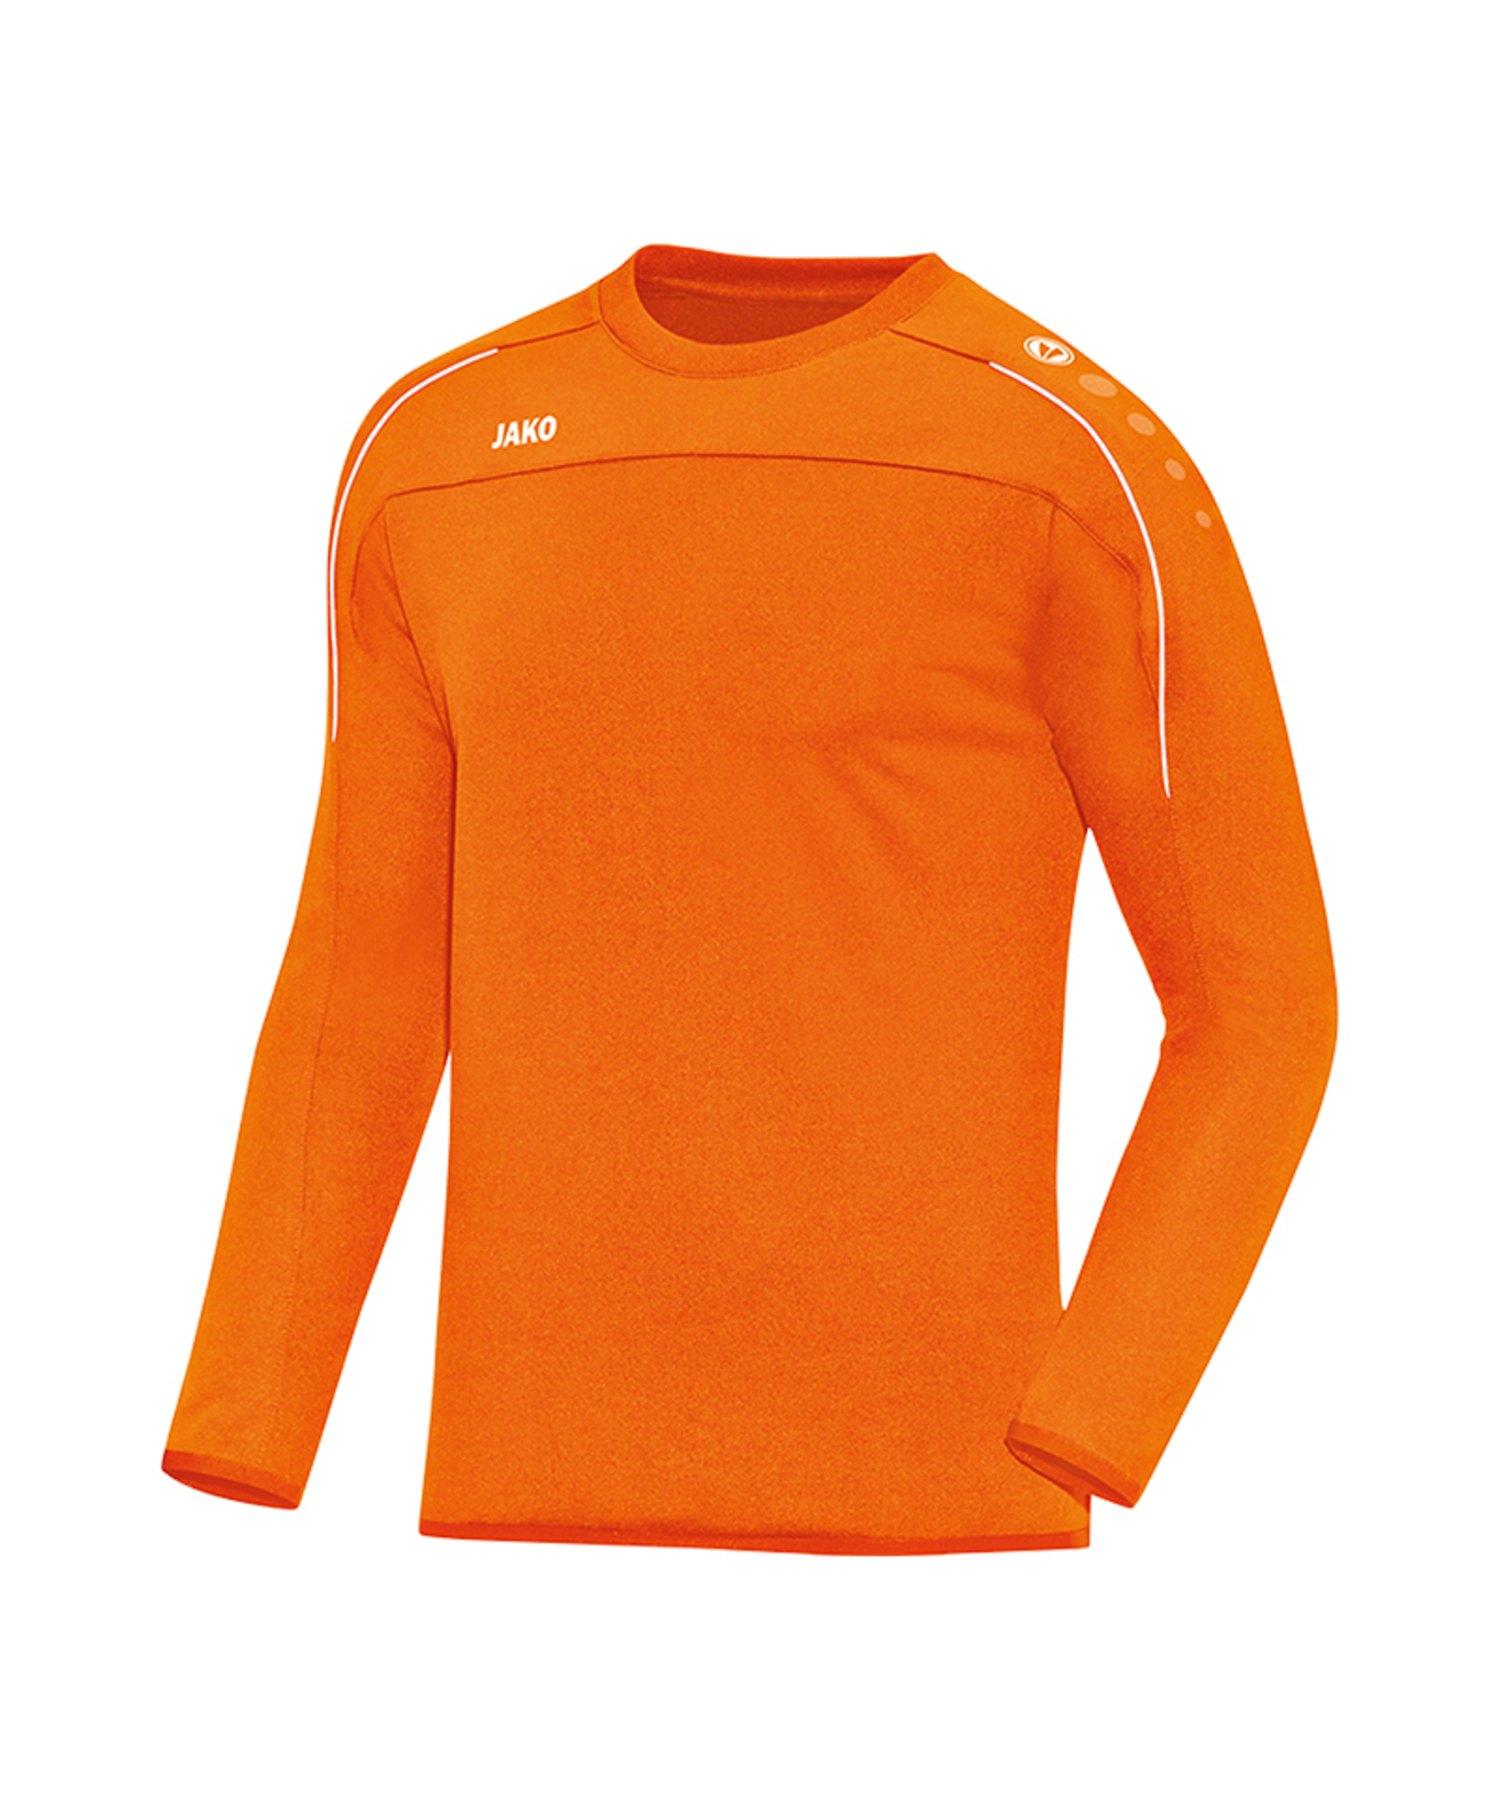 Jako Classico Sweatshirt Orange F19 - Orange